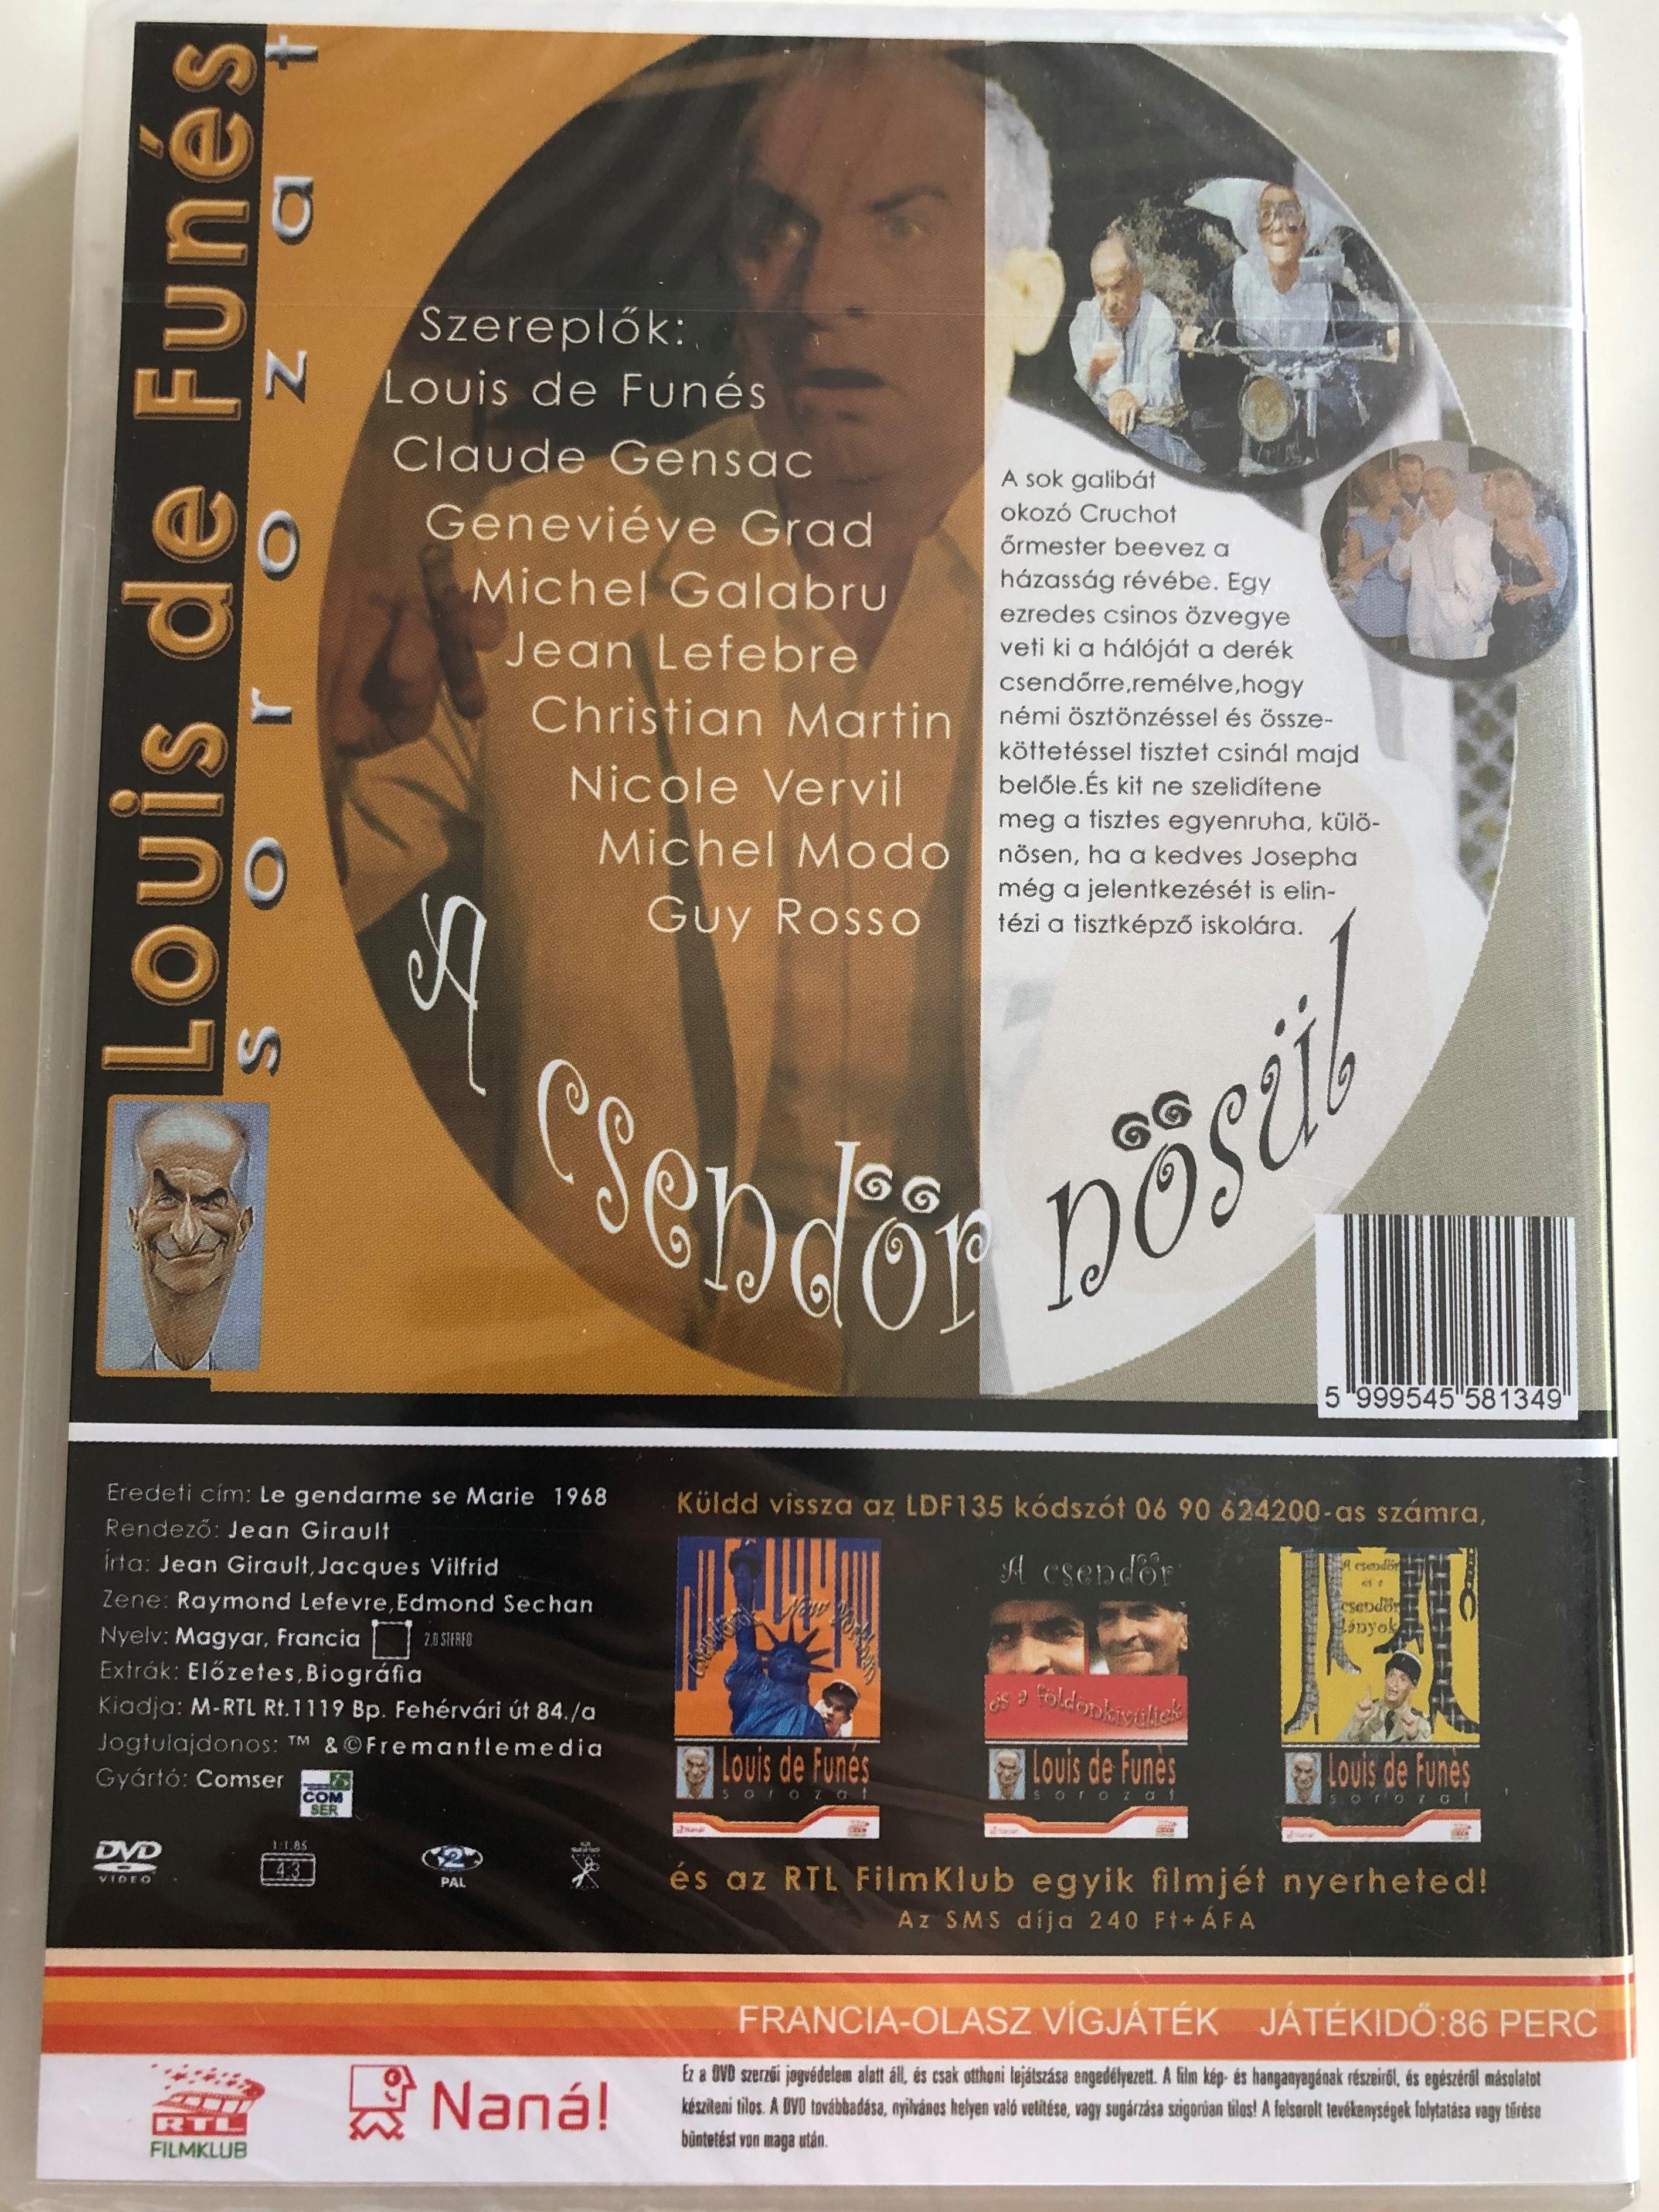 -le-gendarme-se-marie-dvd-1968-a-csend-r-n-s-l-the-gendarme-gets-married-directed-by-jean-girault-starring-louis-de-fun-s-claude-gensac-michel-galabru-louis-de-fun-s-sorozat-disc-2-2-.jpg